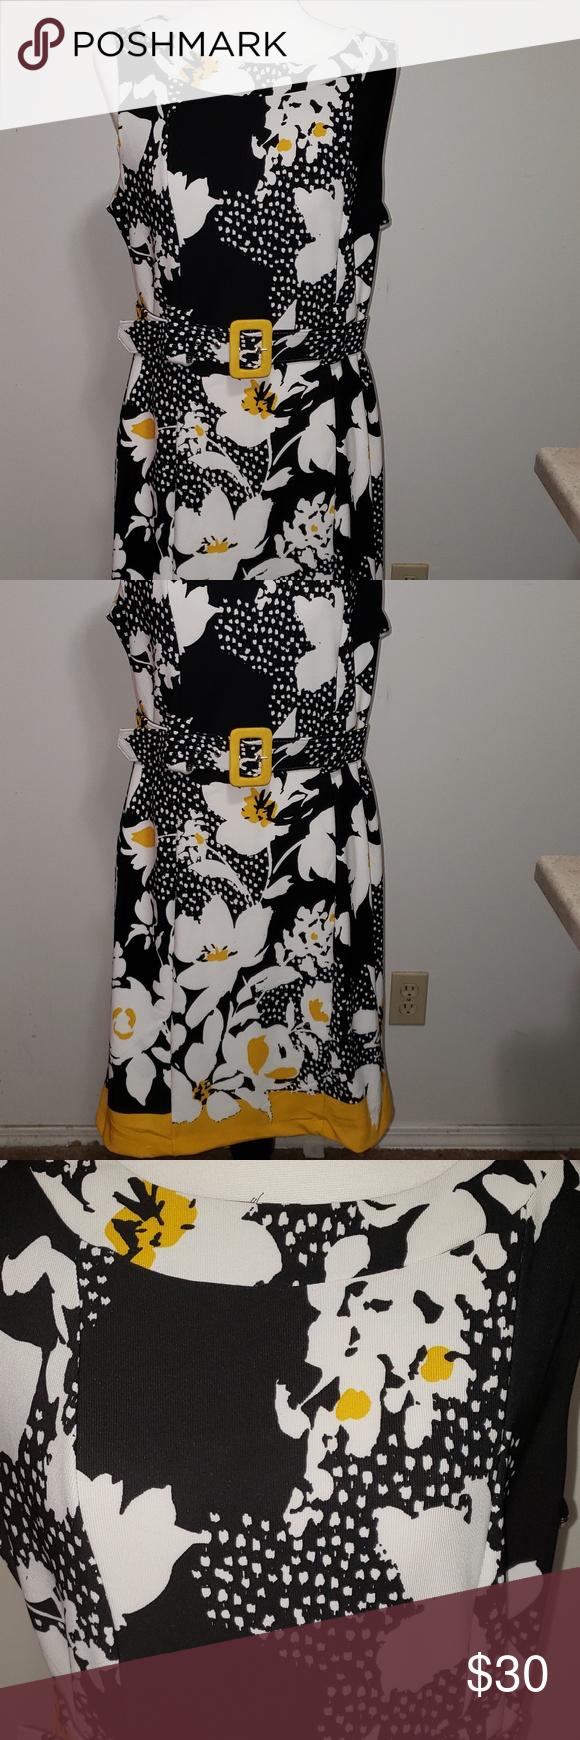 Ile New York Summer Dress14 New York Summer York Dress Yellow Floral [ 1740 x 580 Pixel ]